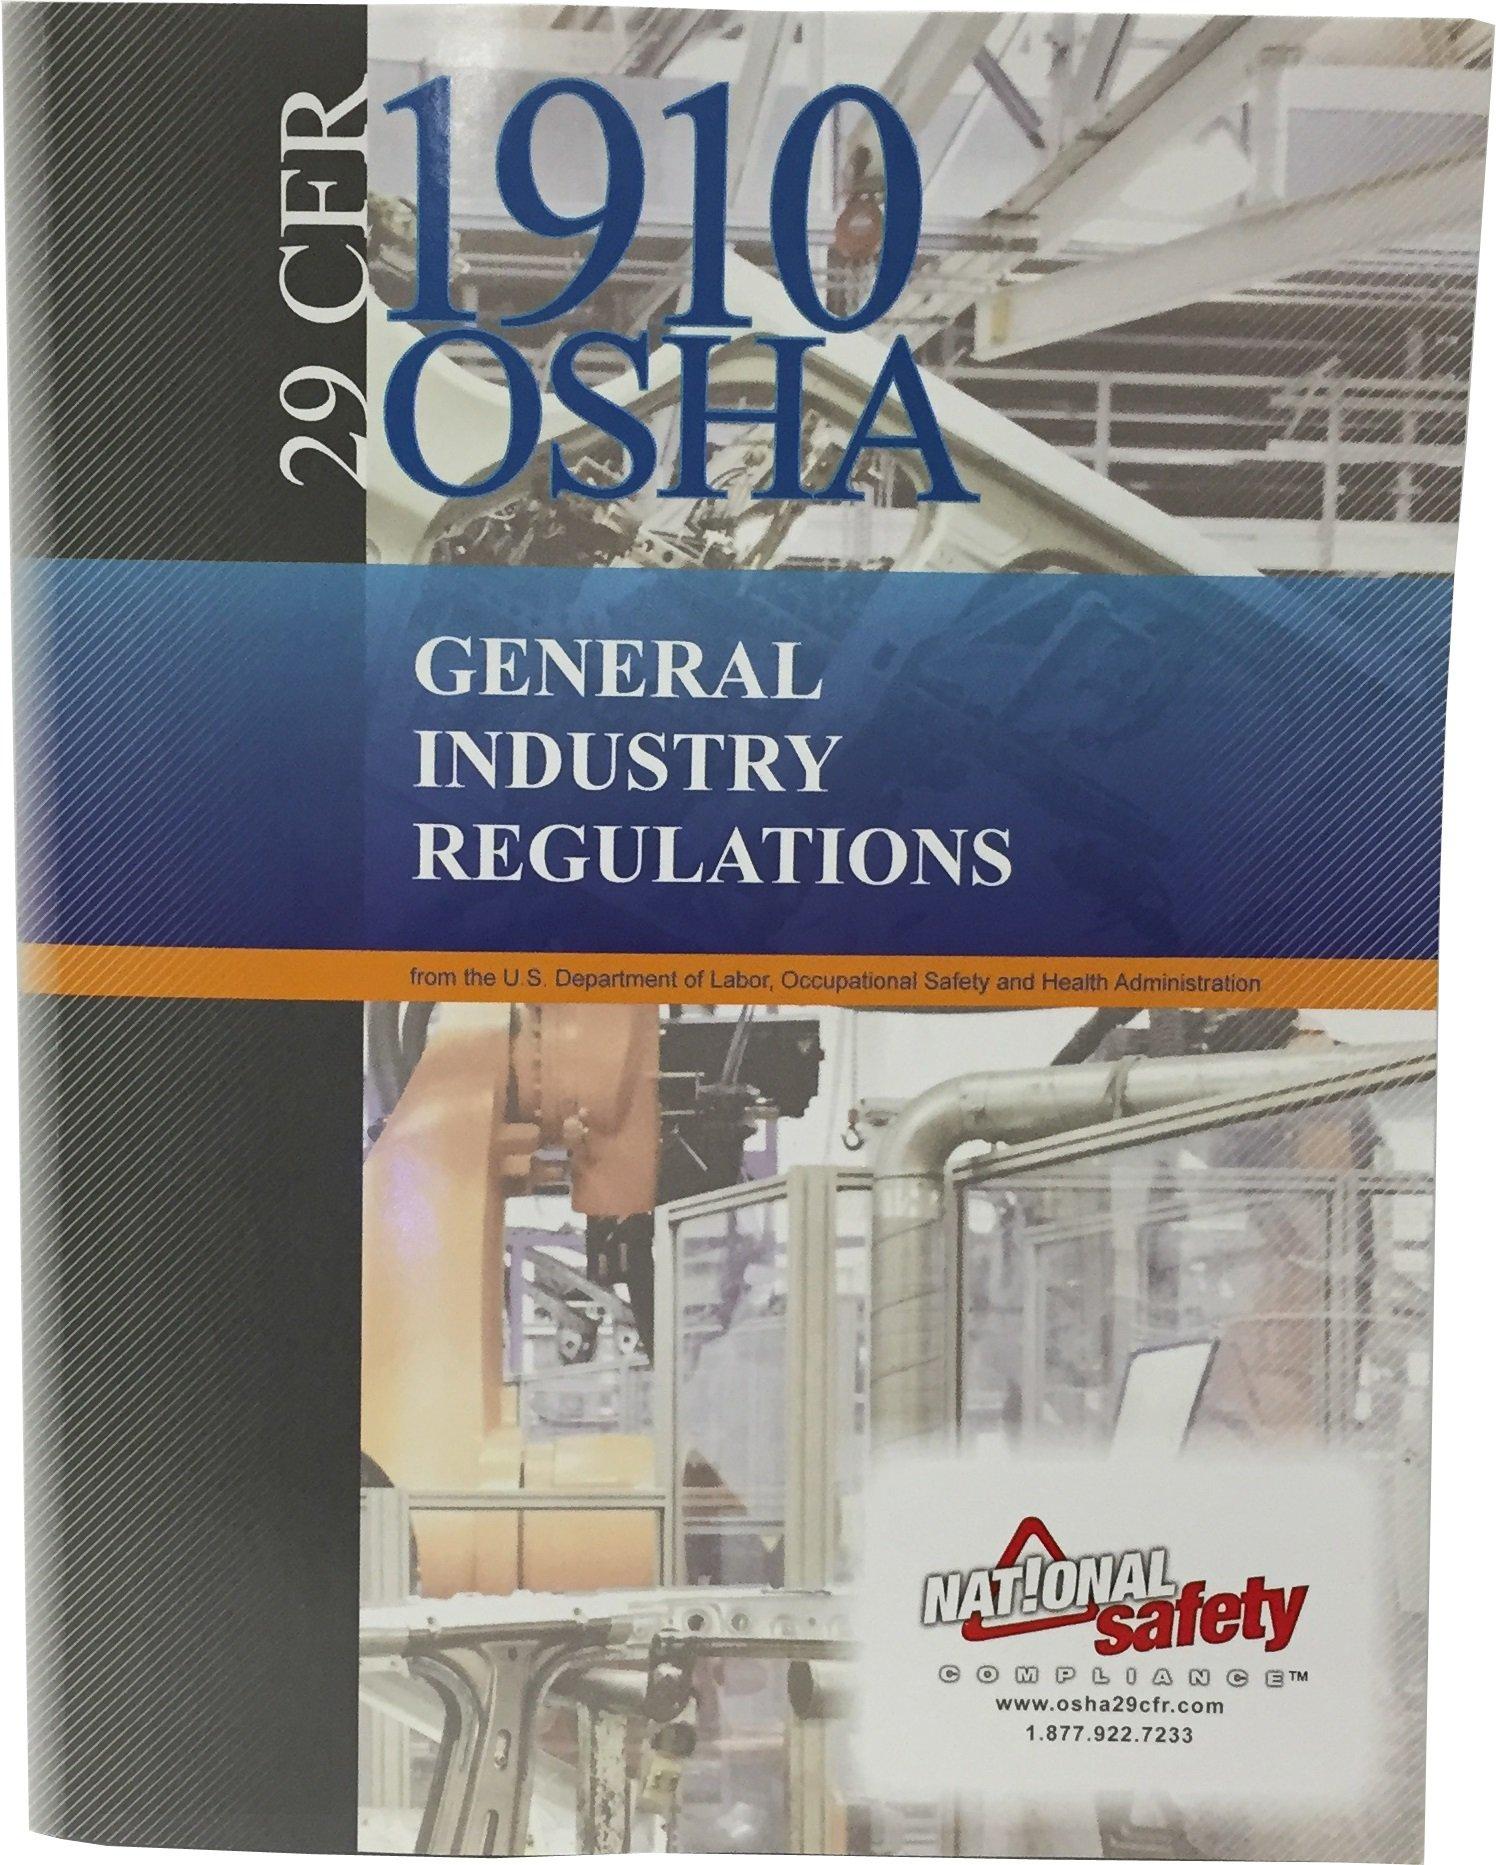 29 CFR 1910 OSHA General Industry Regulations: 9781619463141: Amazon